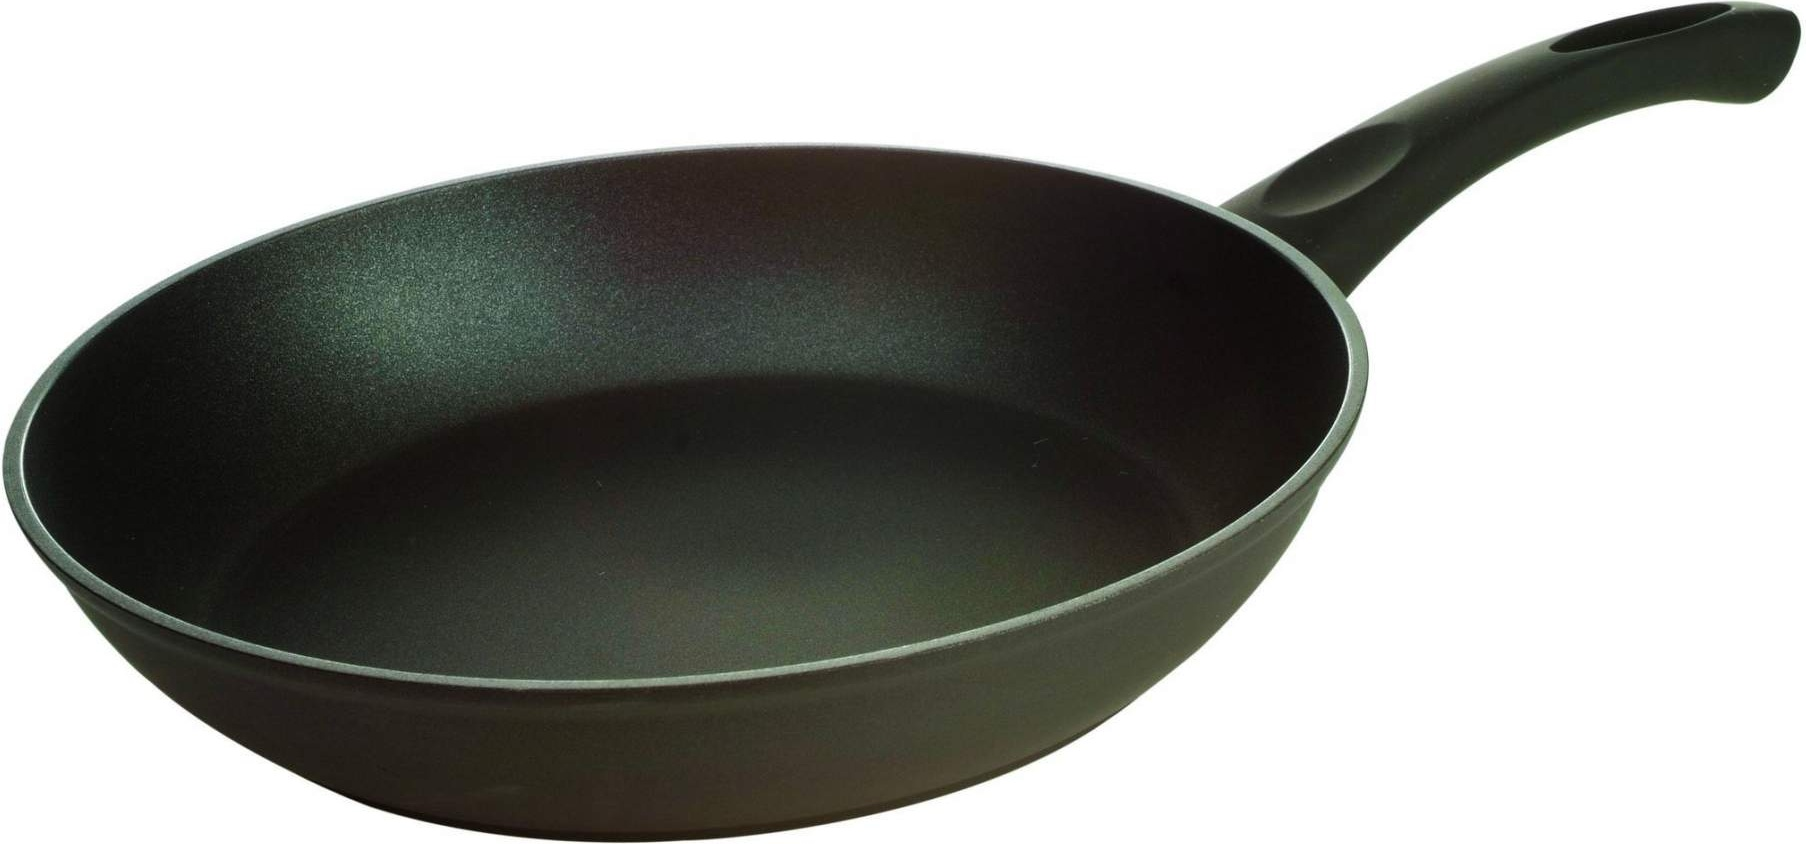 Сковорода REGENT inox Denaro 93-AL-DE-1-28 28 см фото